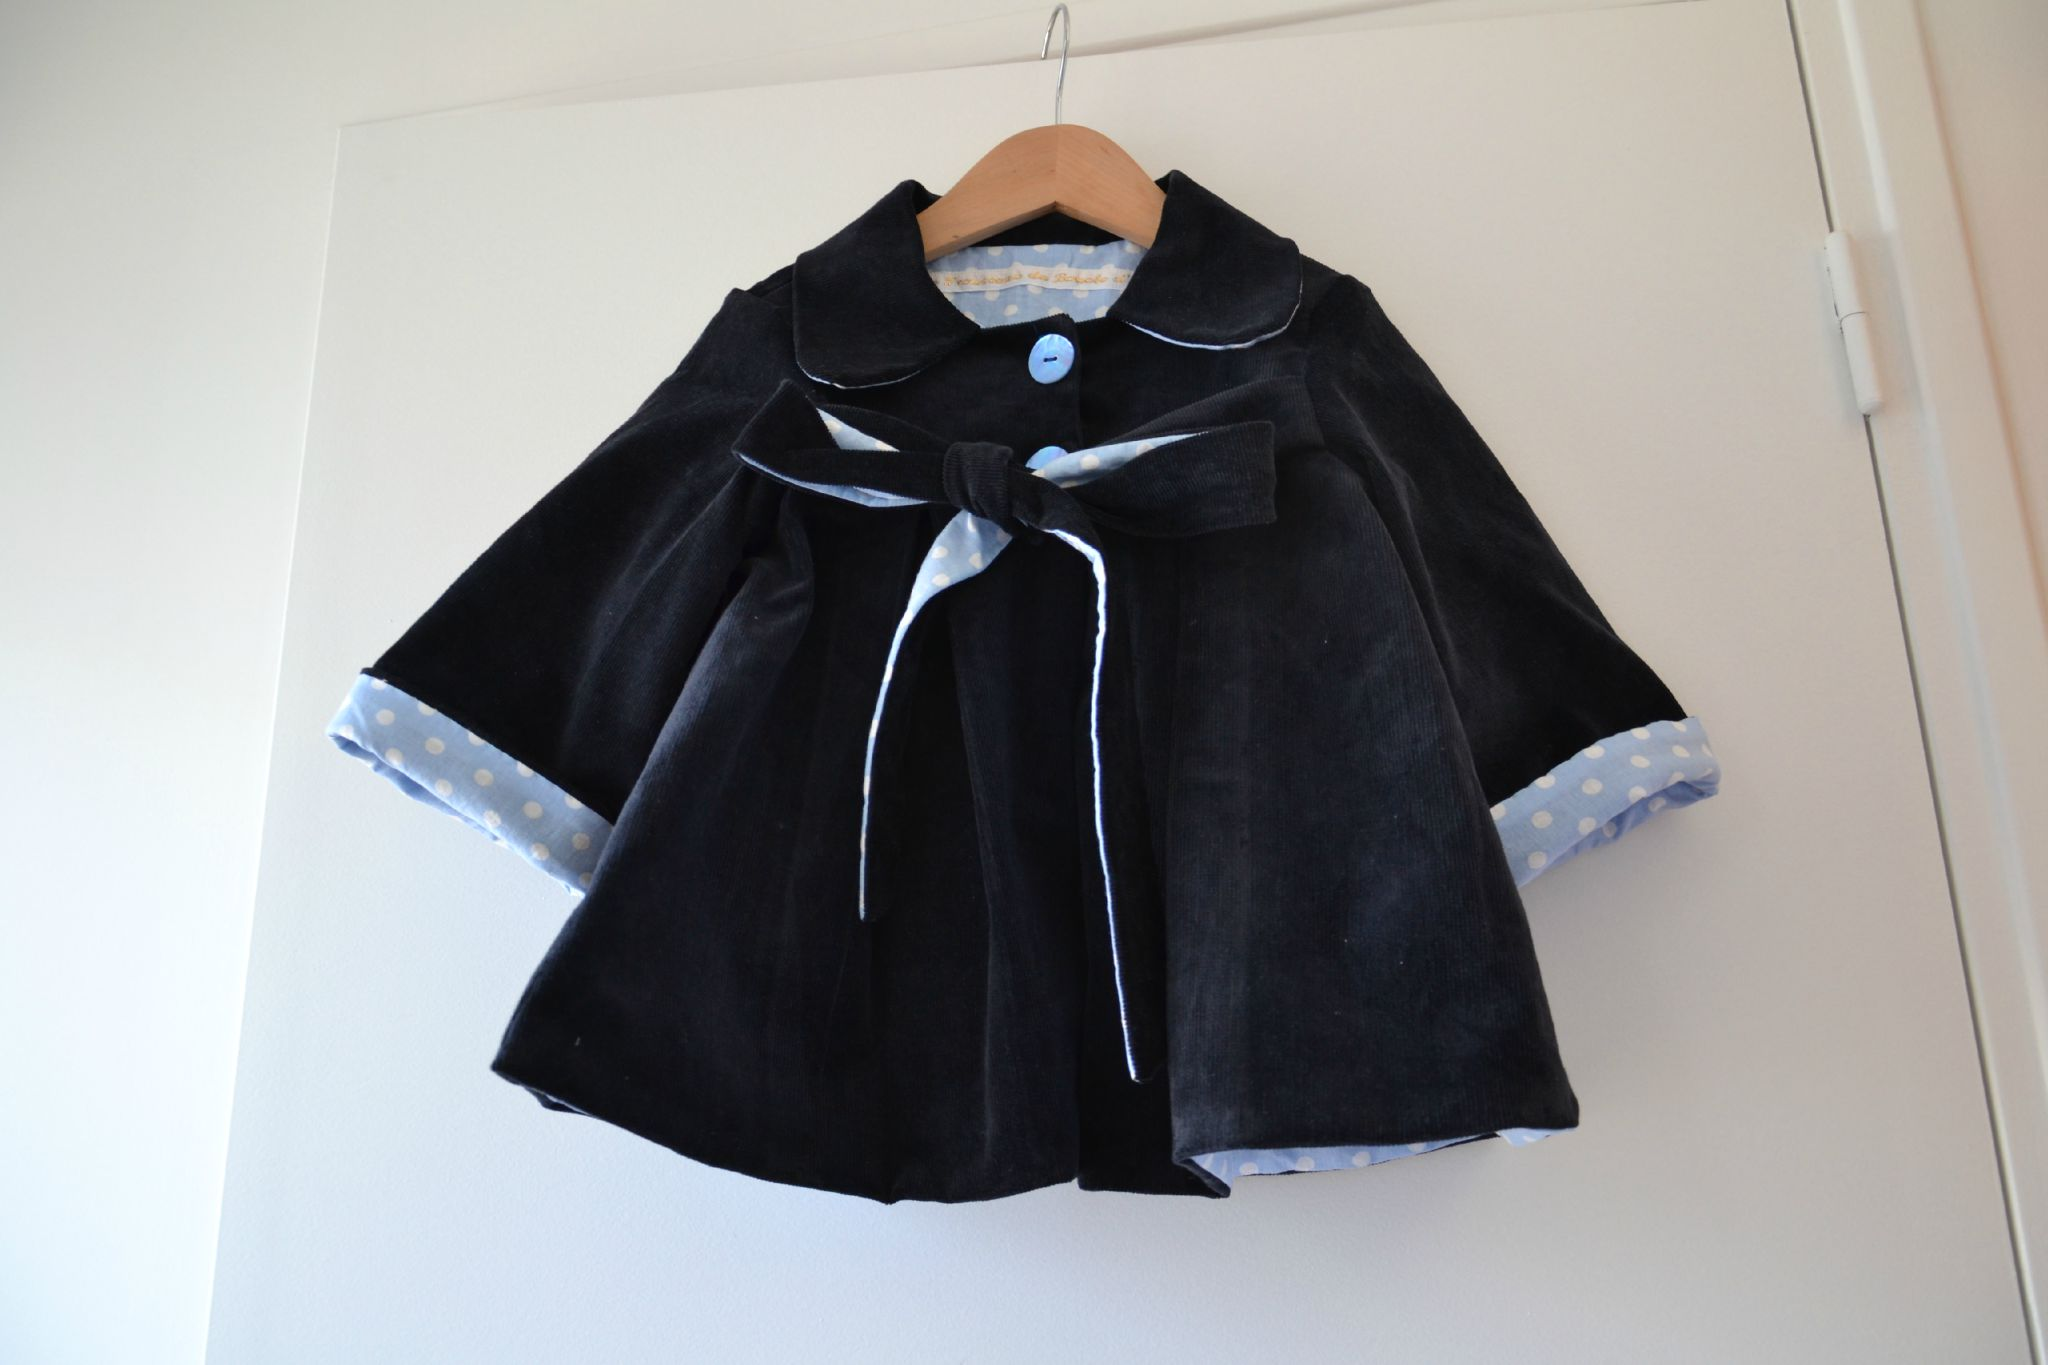 manteau bleu marine pois ciel (14)